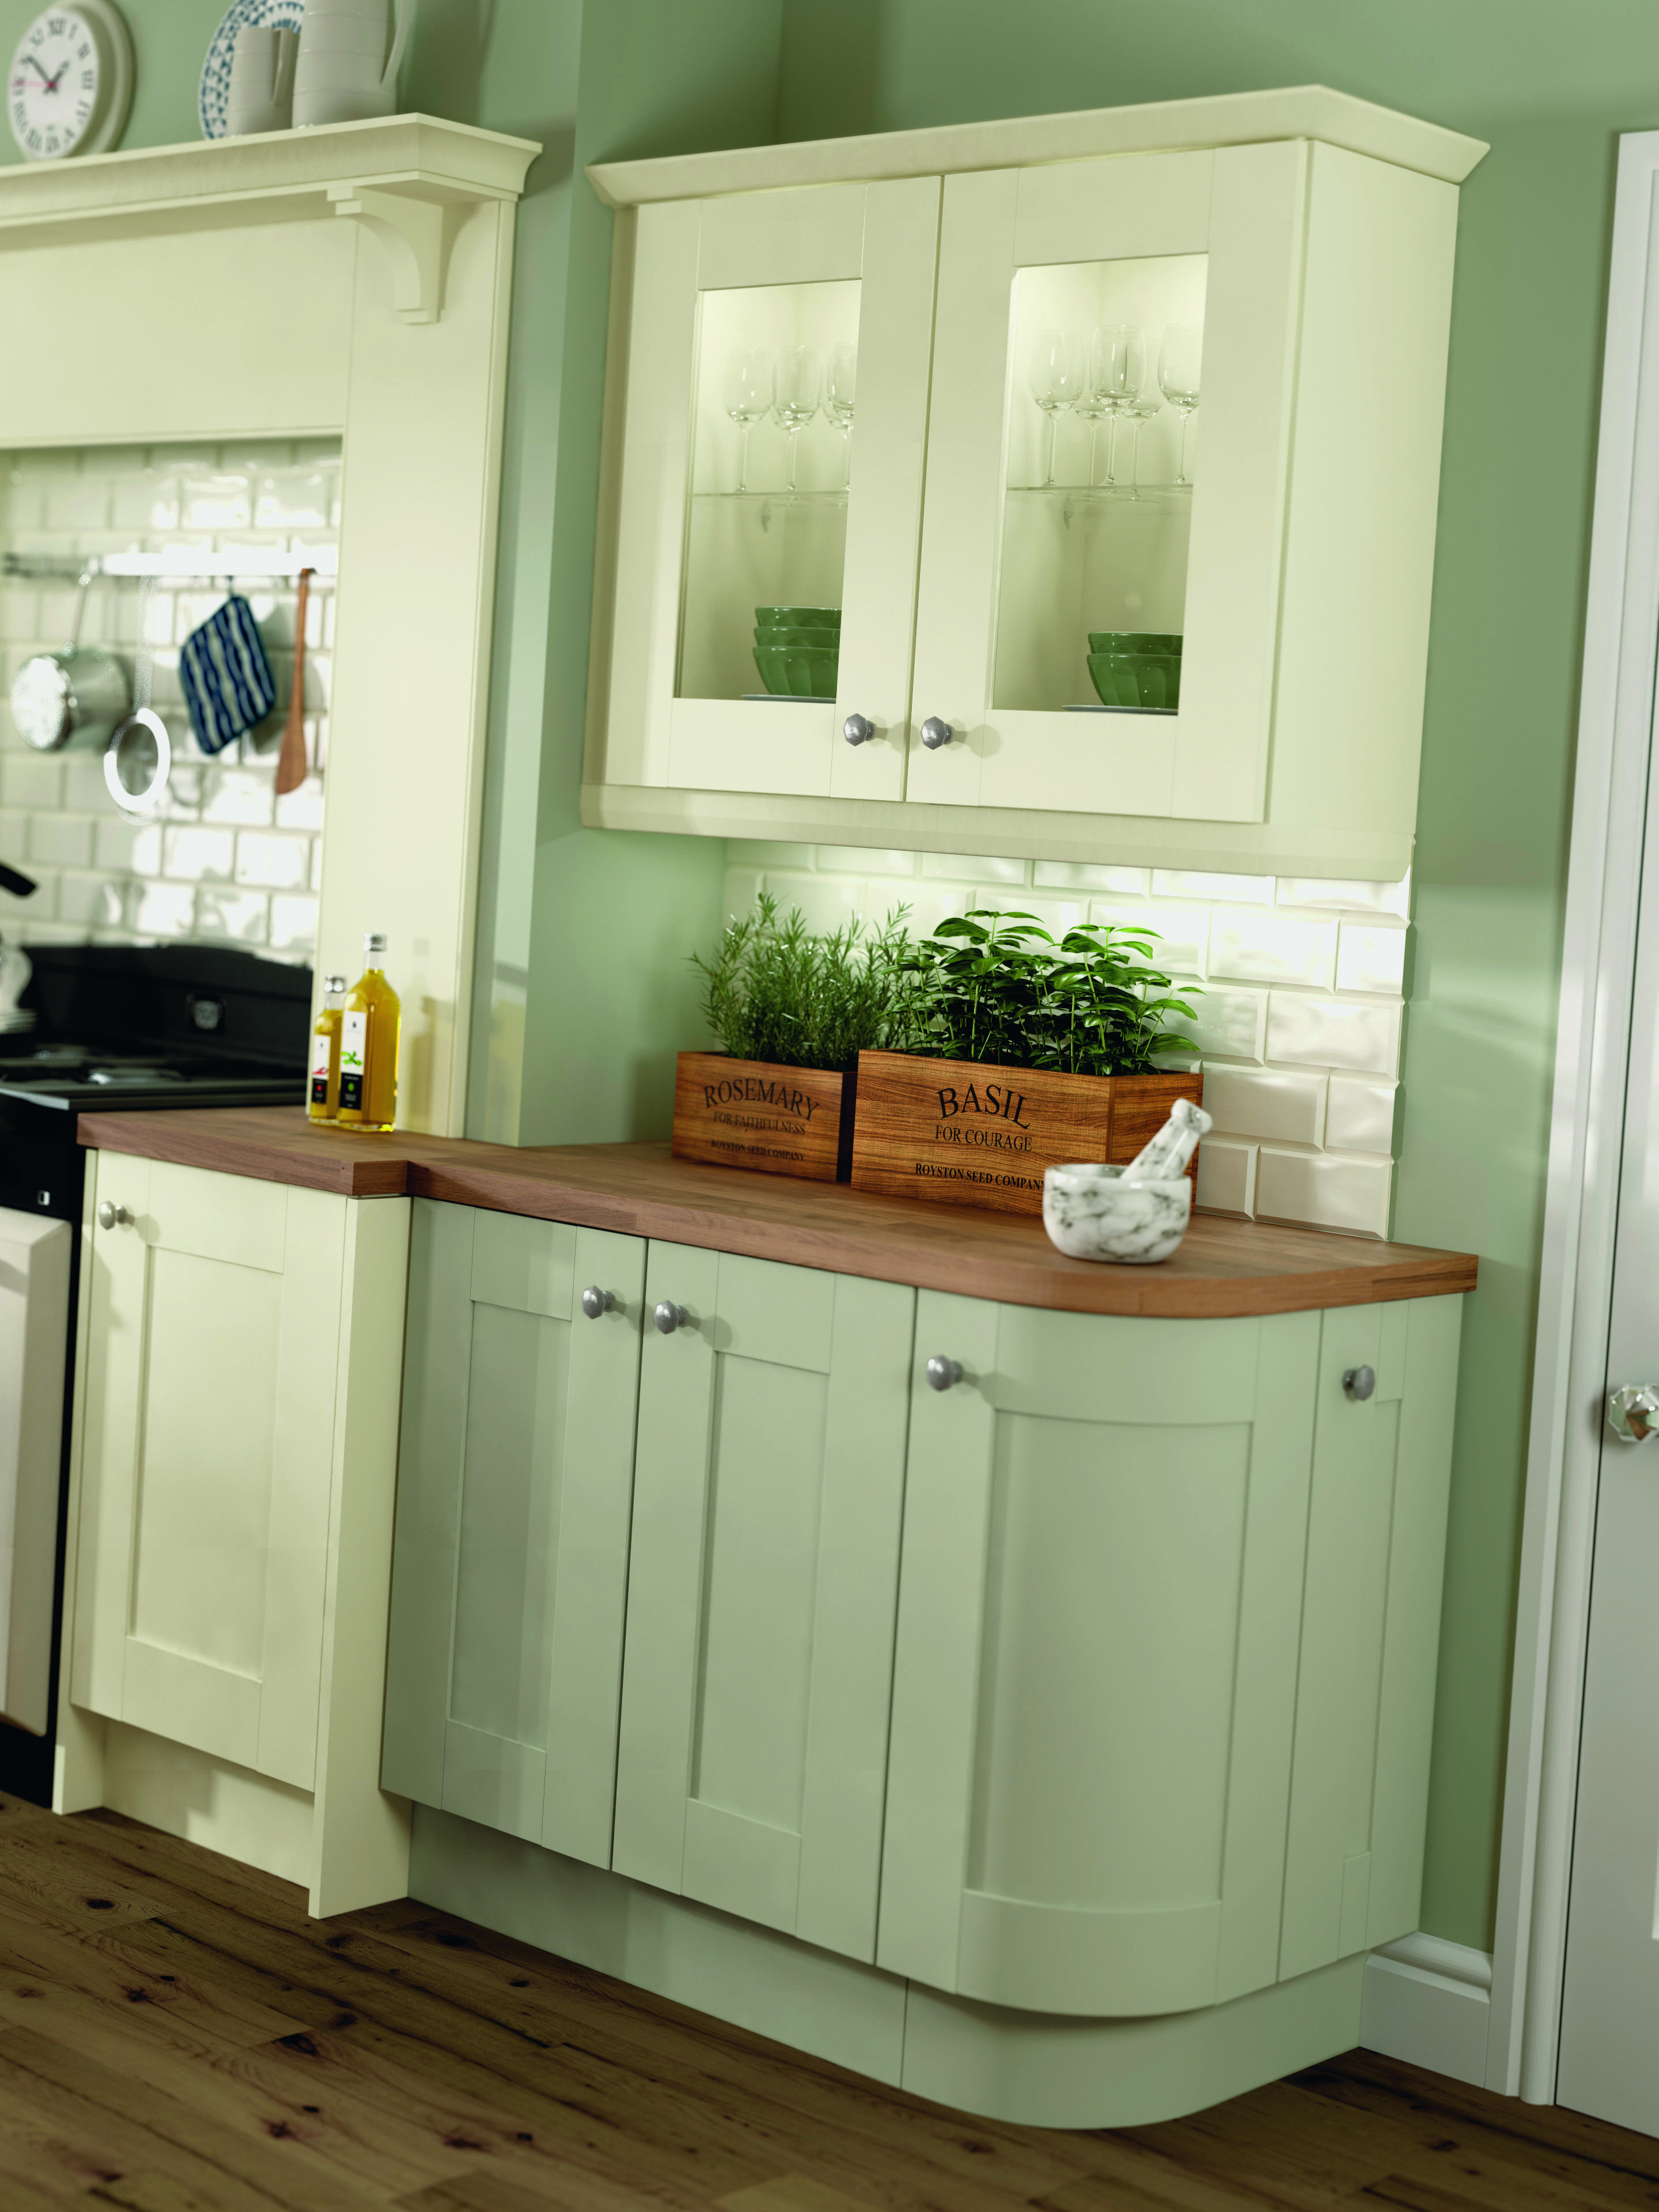 Rockfort Ivory and Cranbrook Sage livingroomlighting